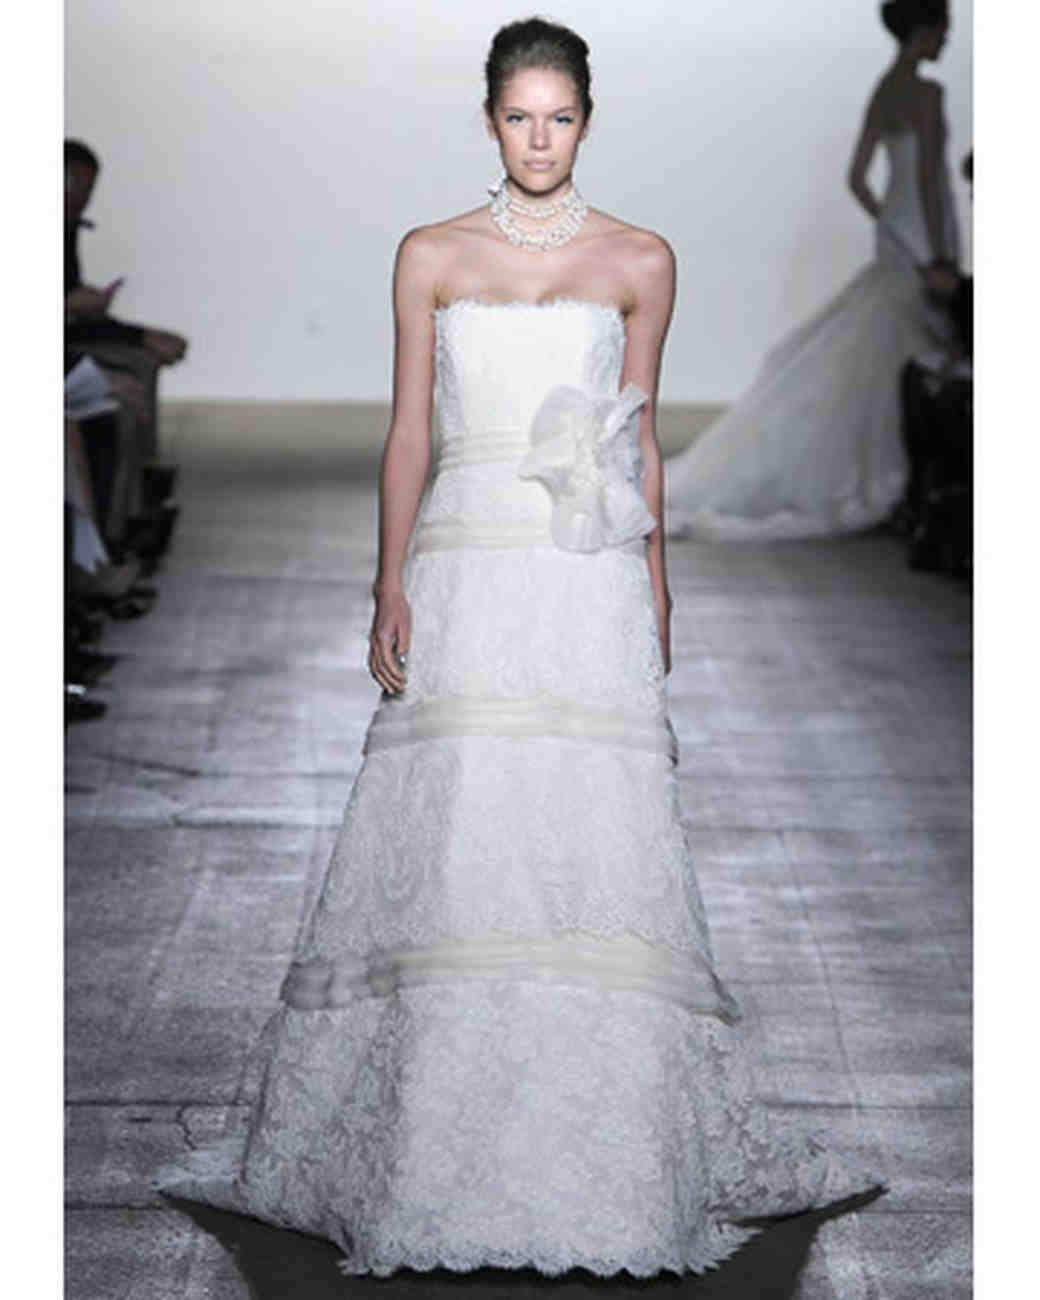 2012 Wedding Dresses with Straps